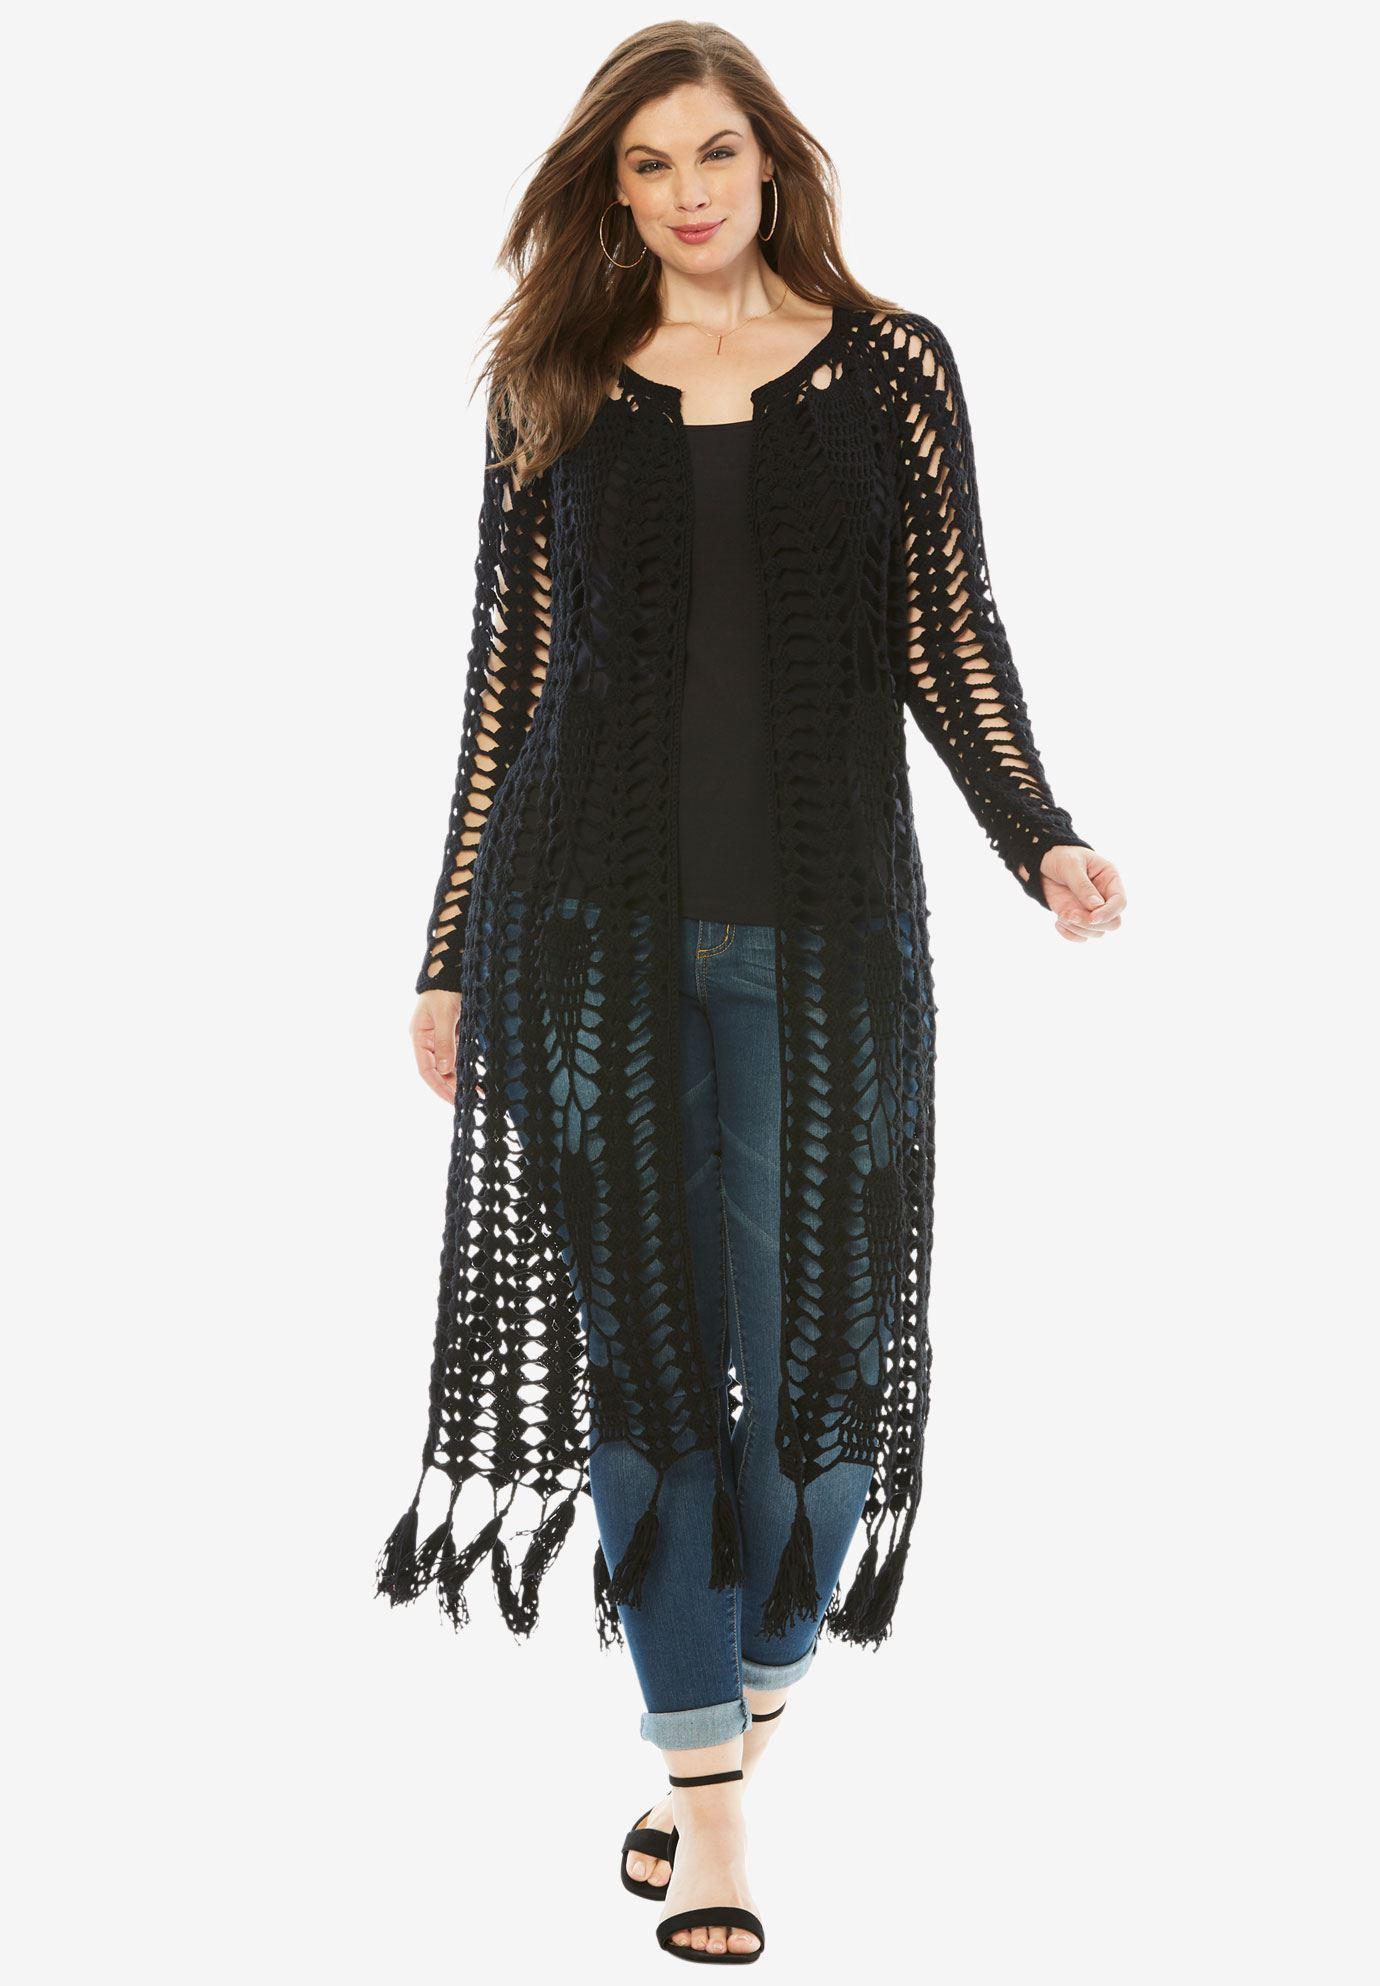 69d88e640 Long Crochet Cardigan with Fringe